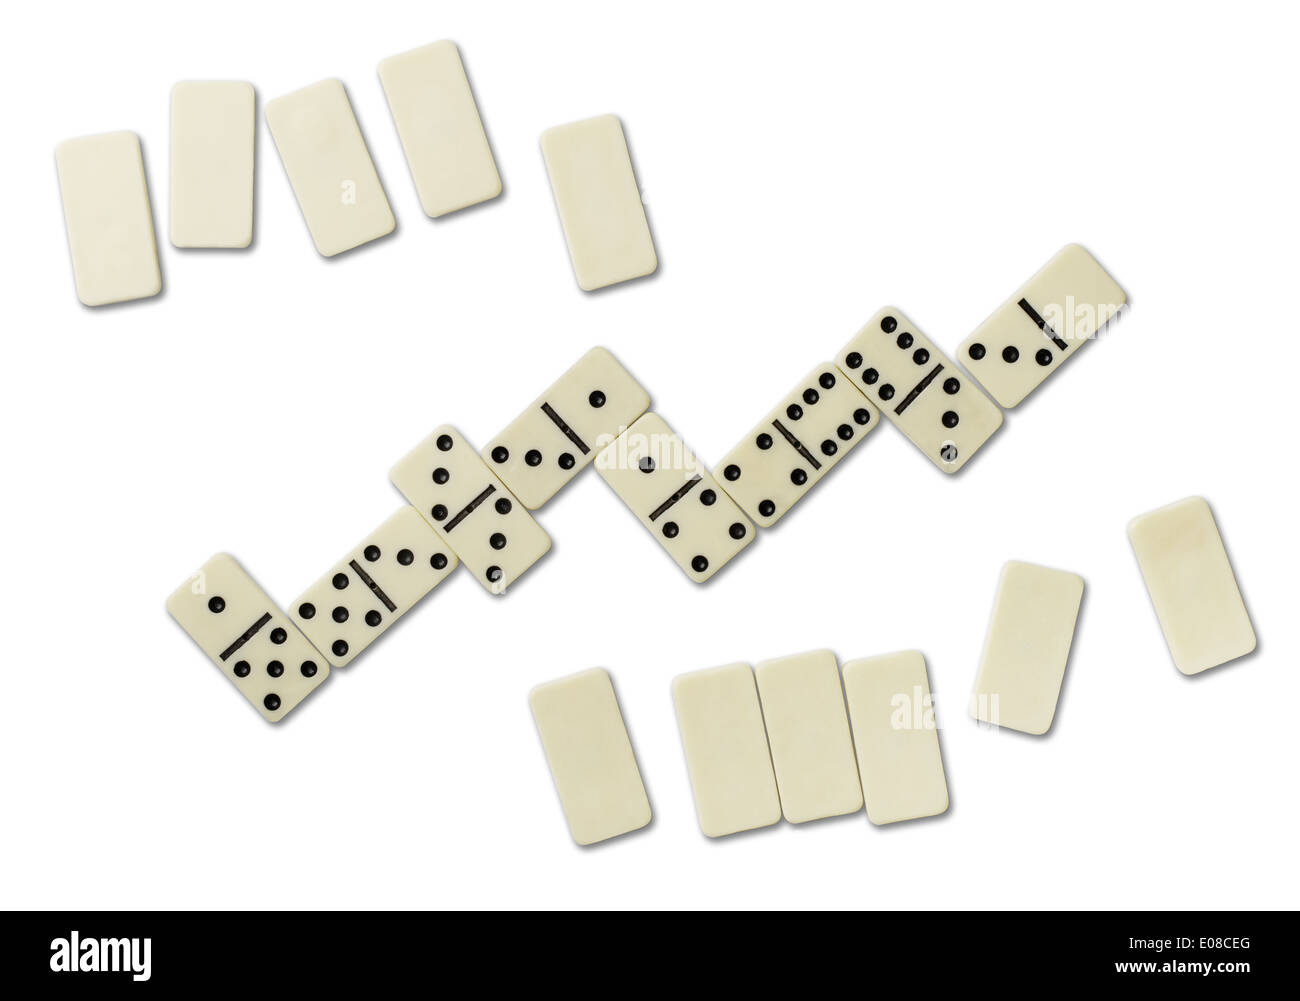 Domino Photos Domino Images Alamy